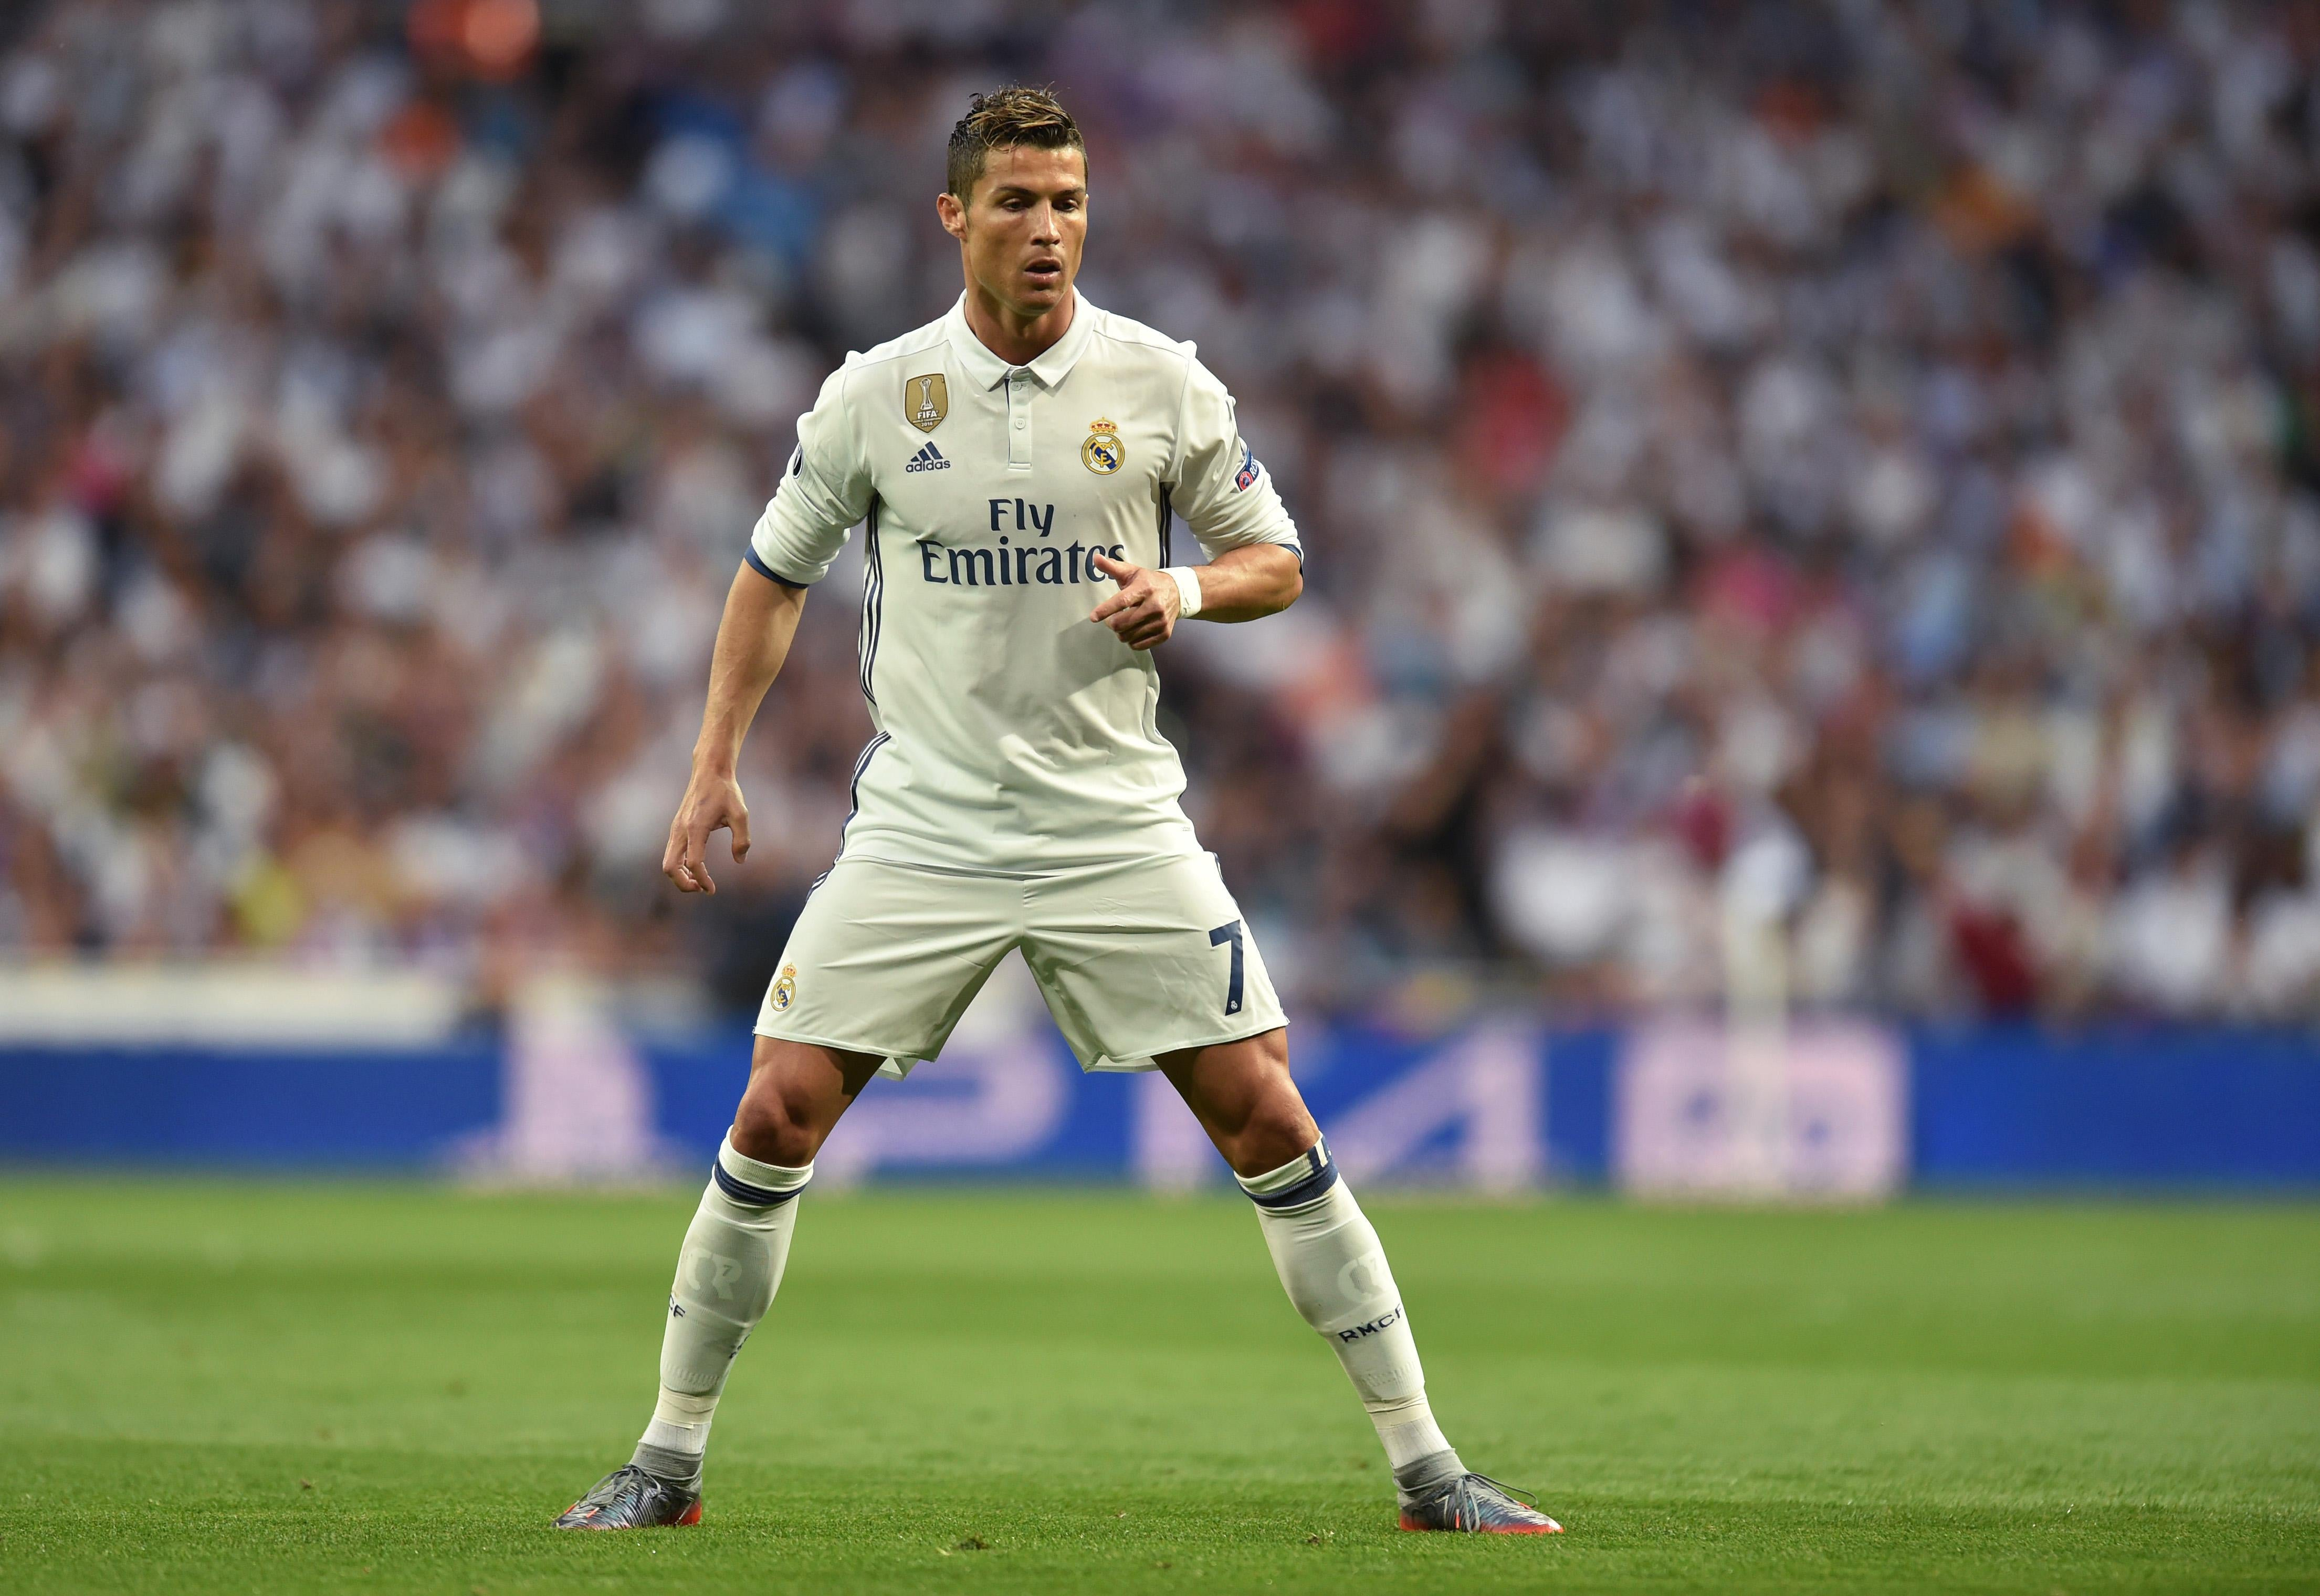 Real Madrid's Portuguese forward Cristiano Ronaldo prepares for a free kick.